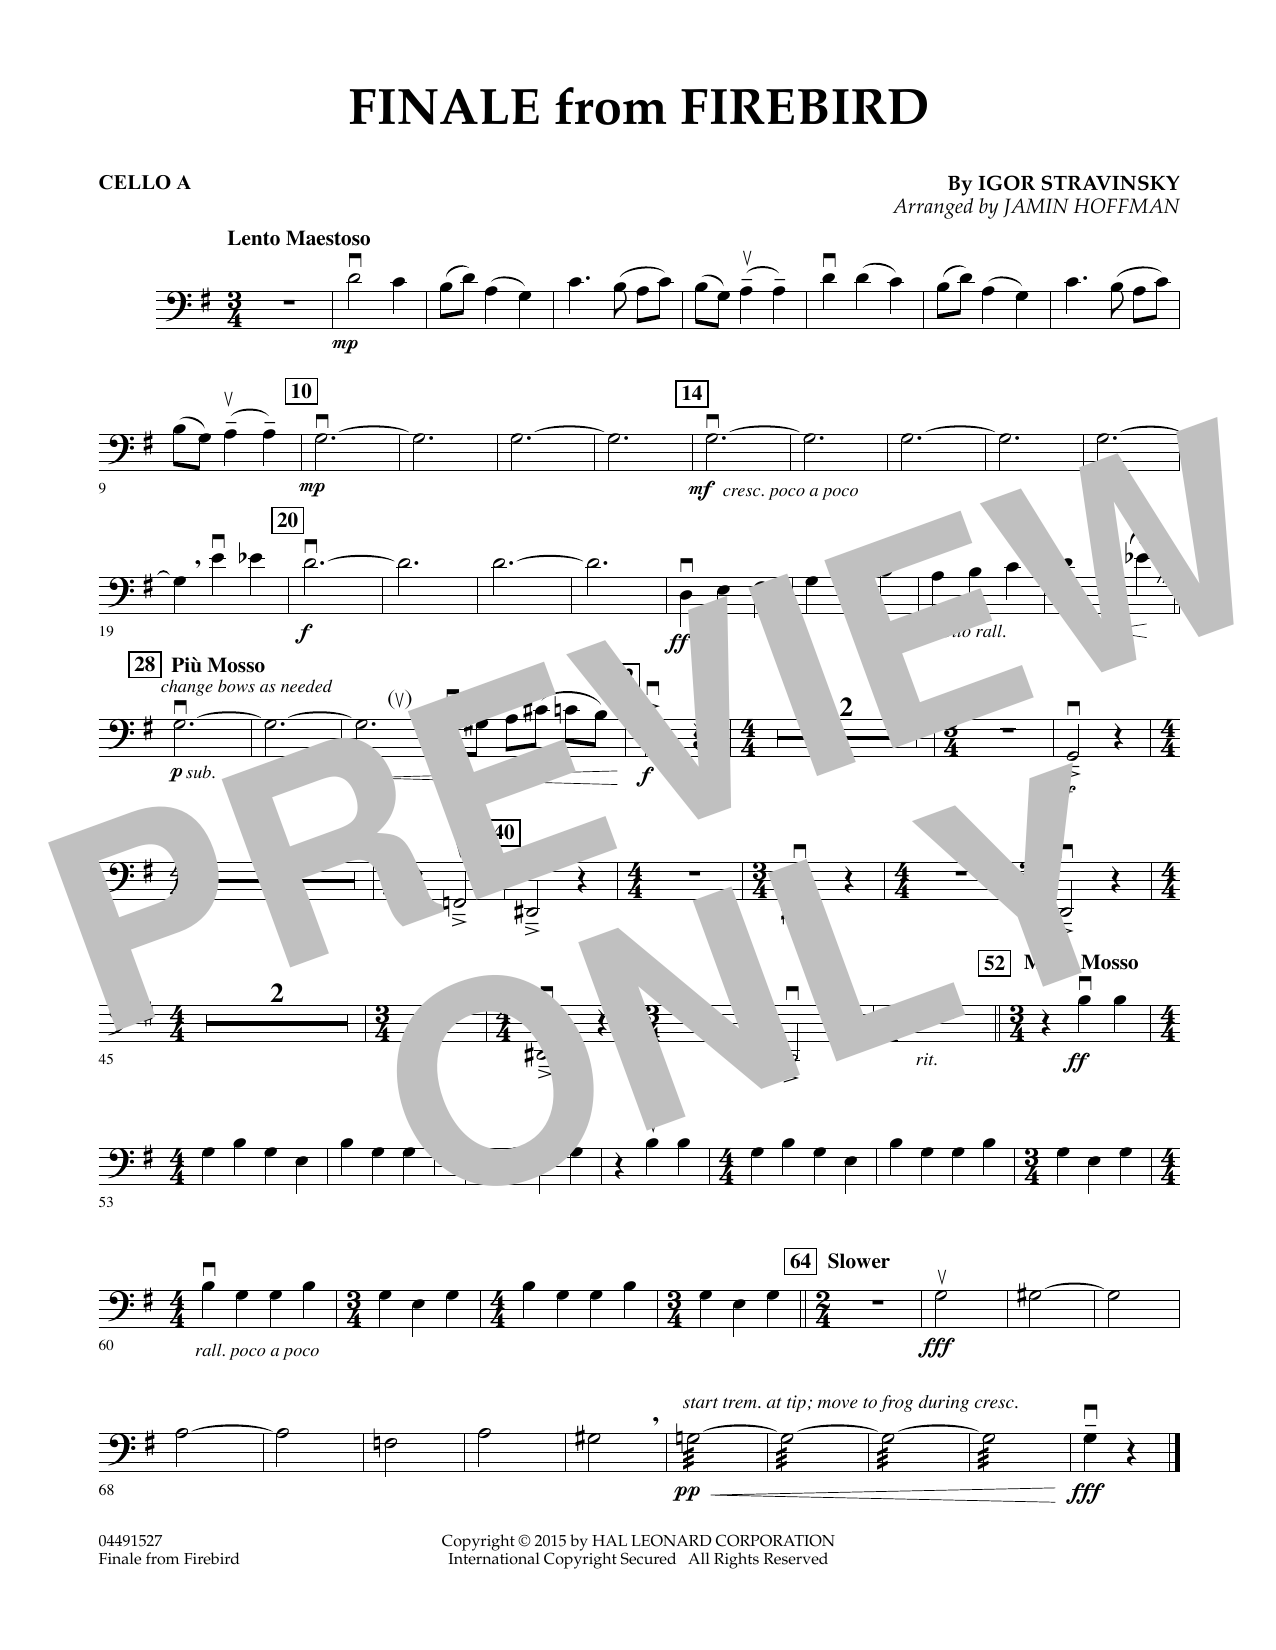 Finale from Firebird (arr. Jamin Hoffman) - Cello A (Orchestra)